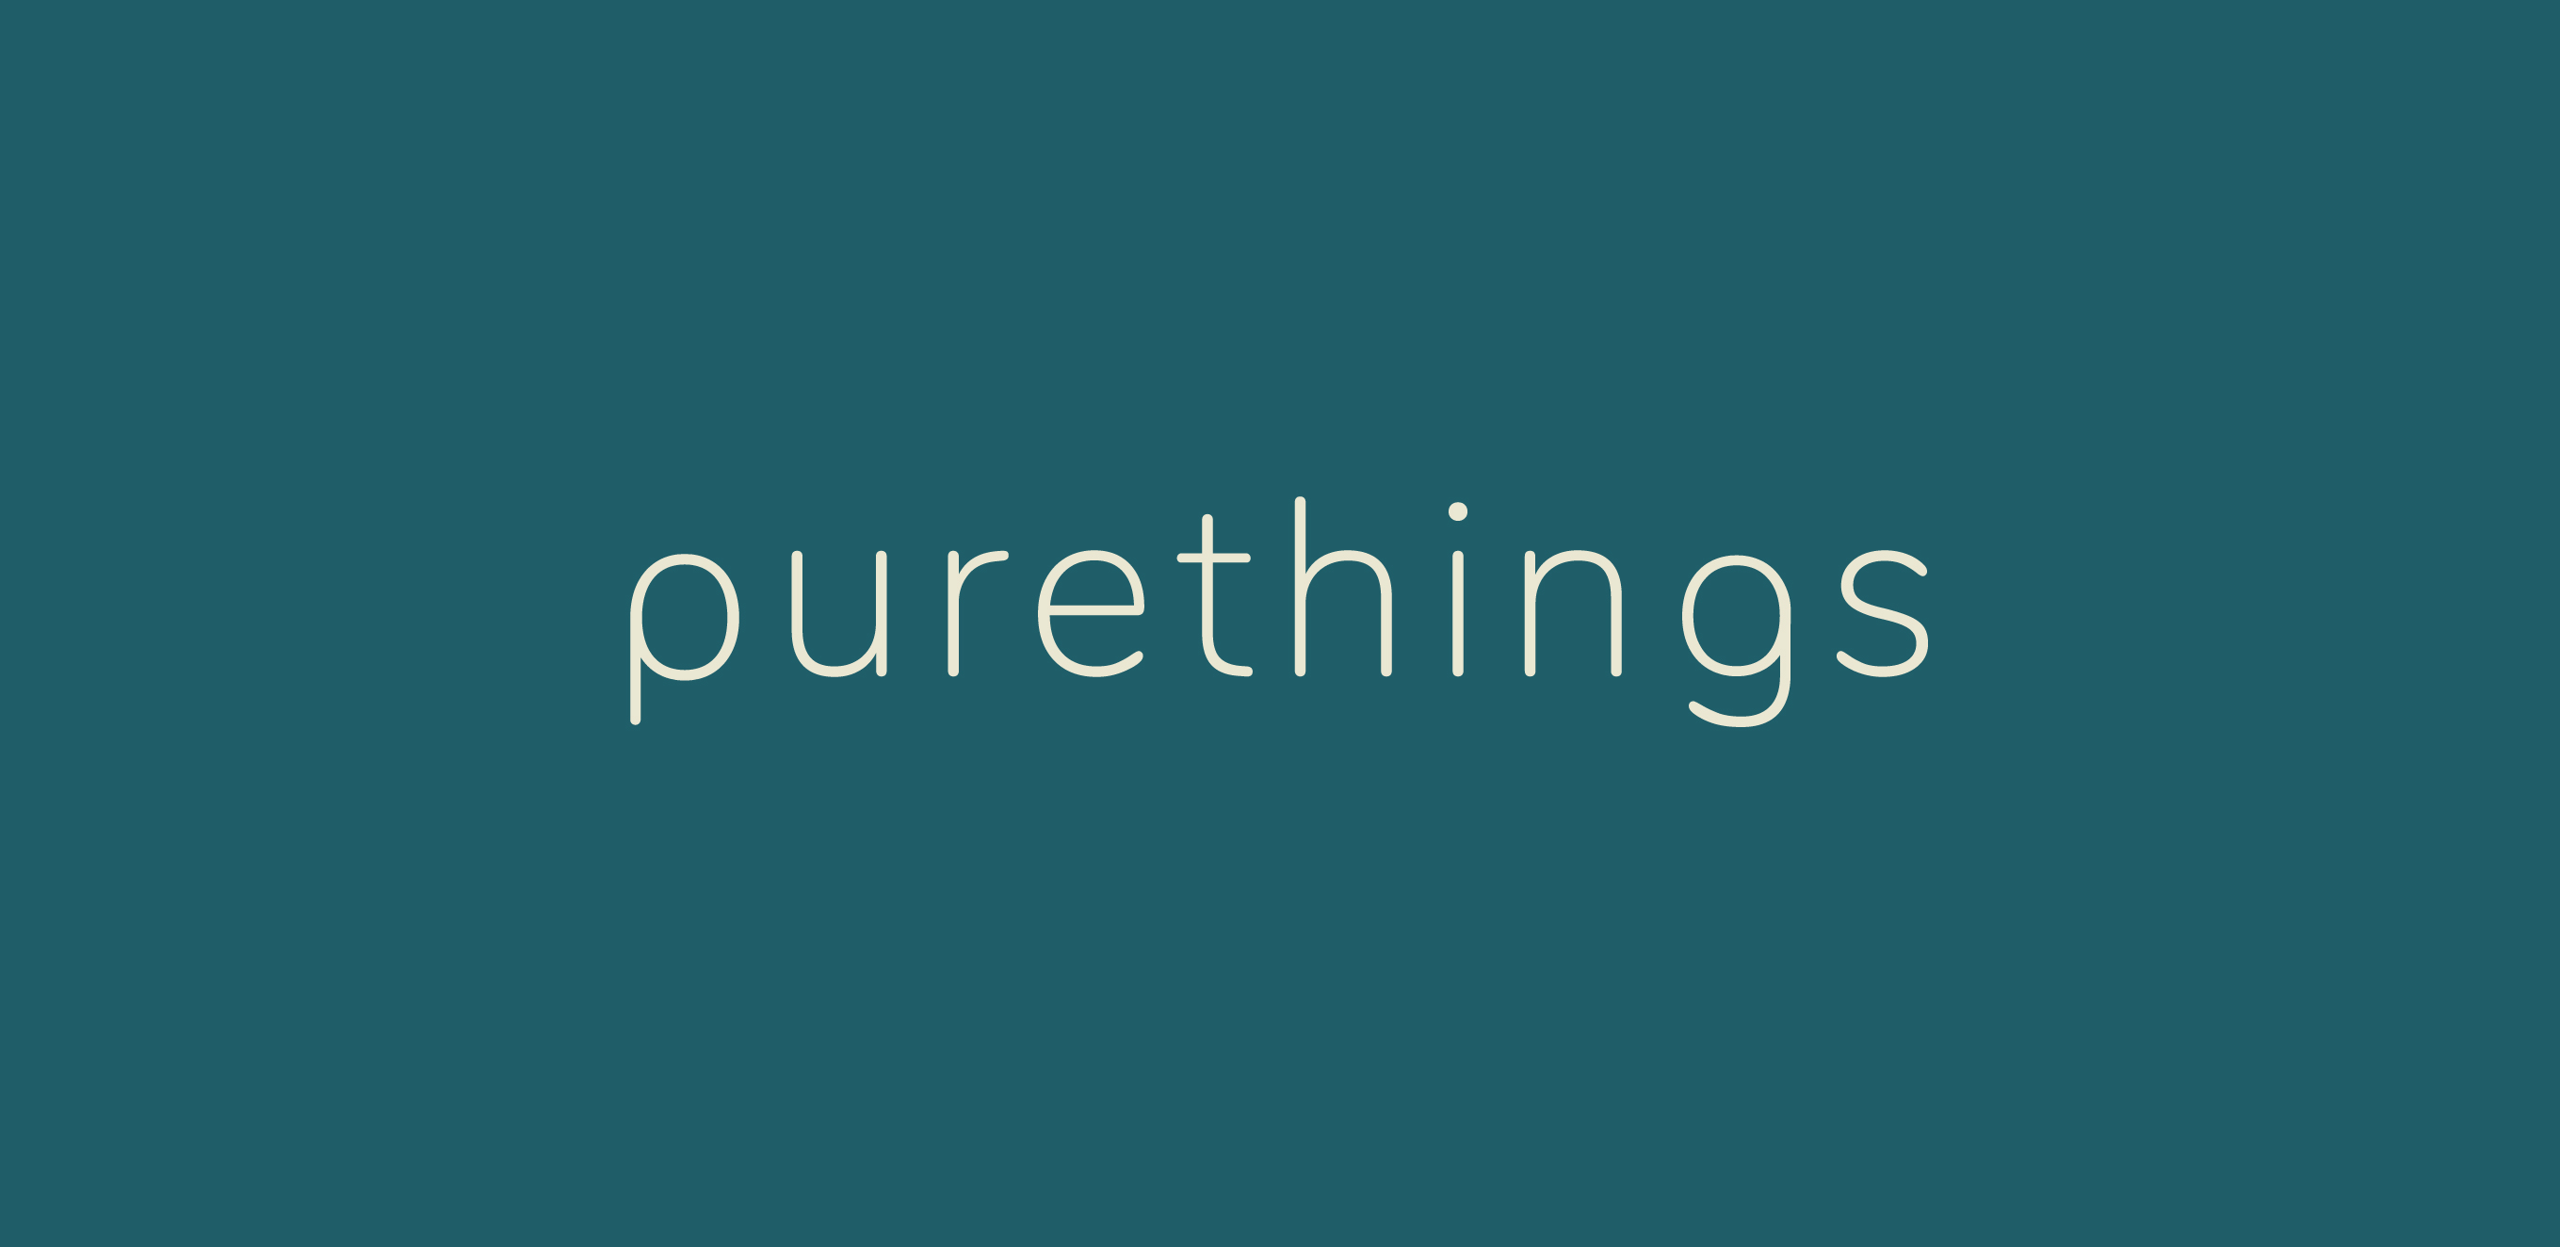 Purethings Word Mark Logo